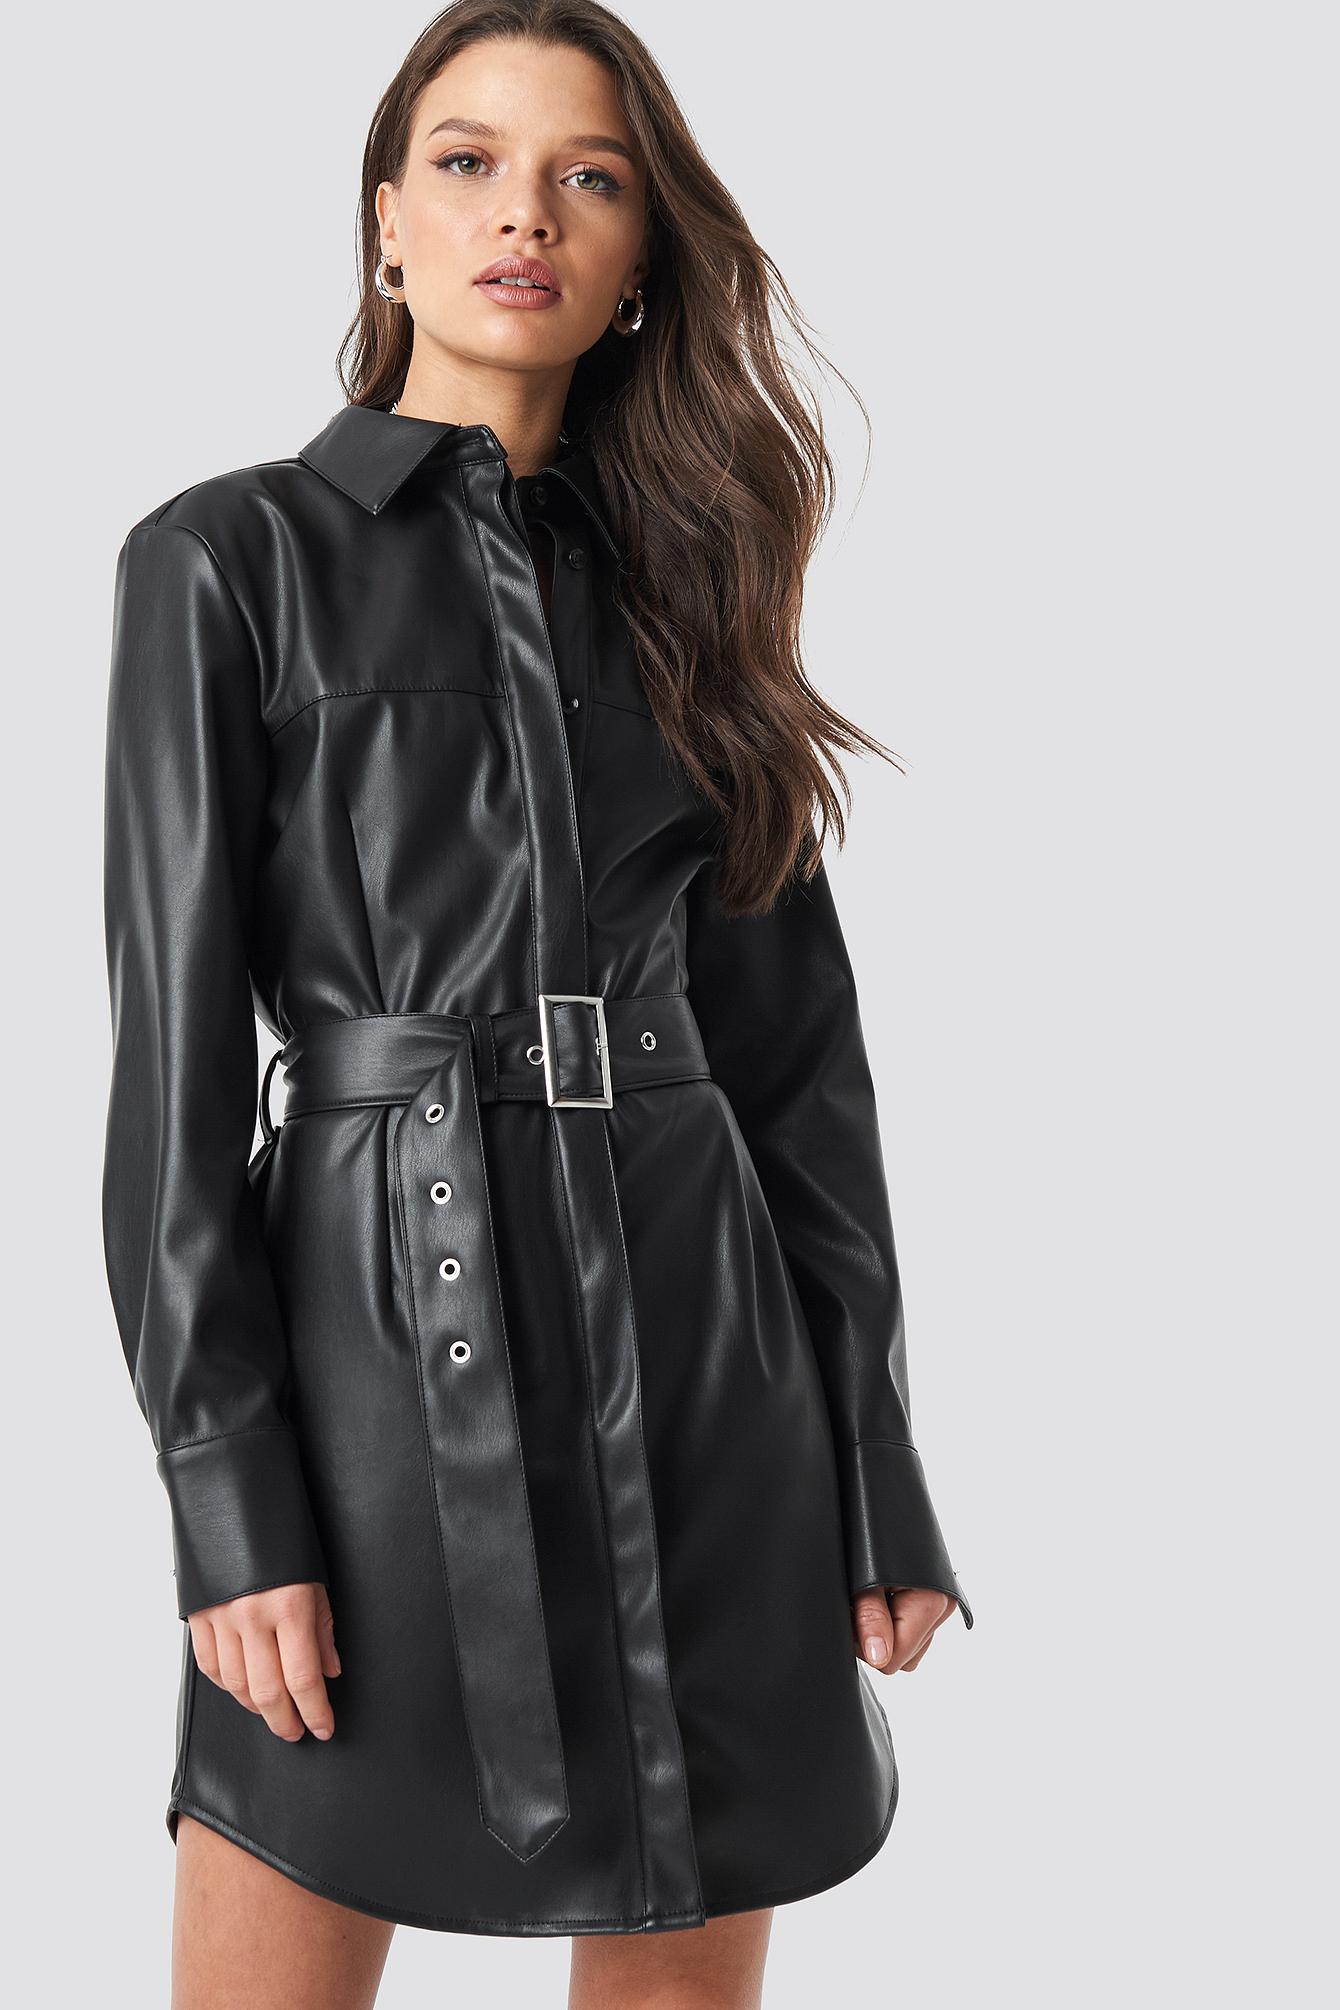 linn ahlborg x na-kd -  PU Leather Shirt Dress - Black